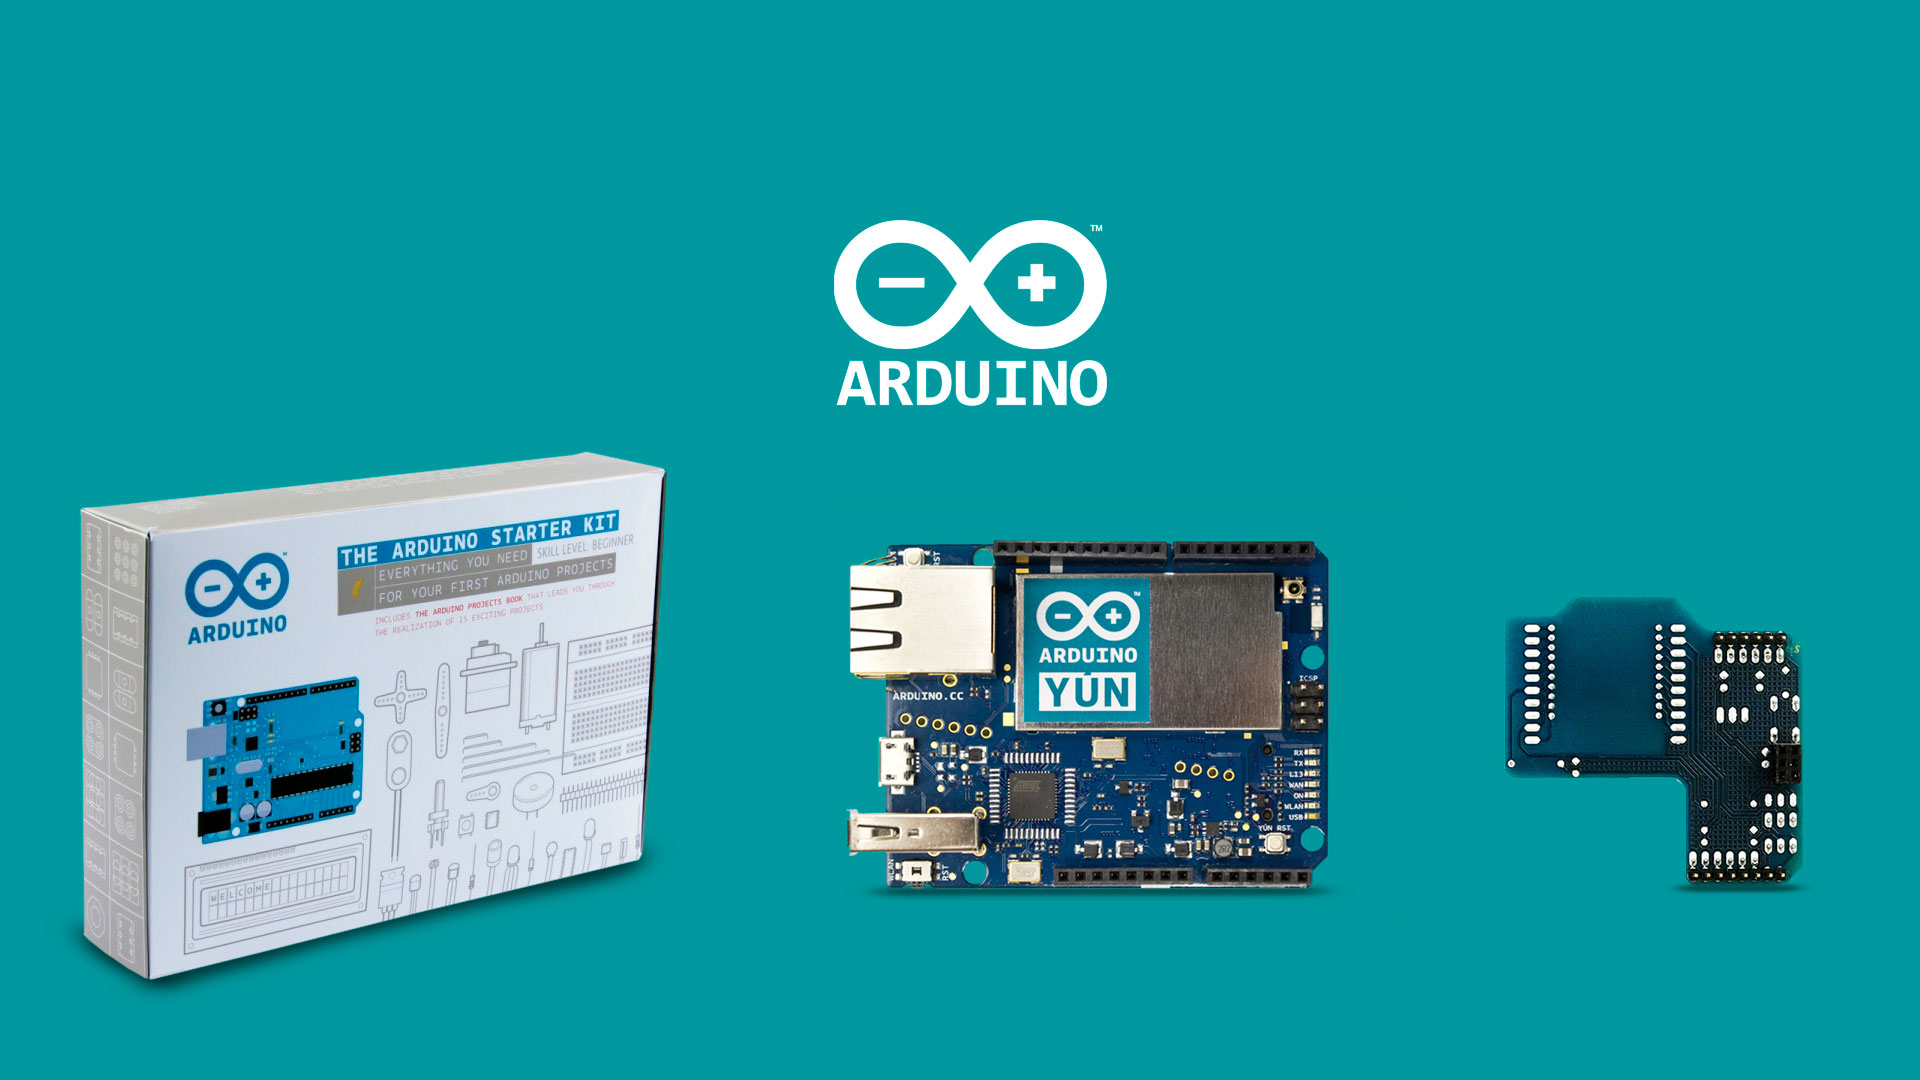 Arduino Distribuidor Oficial